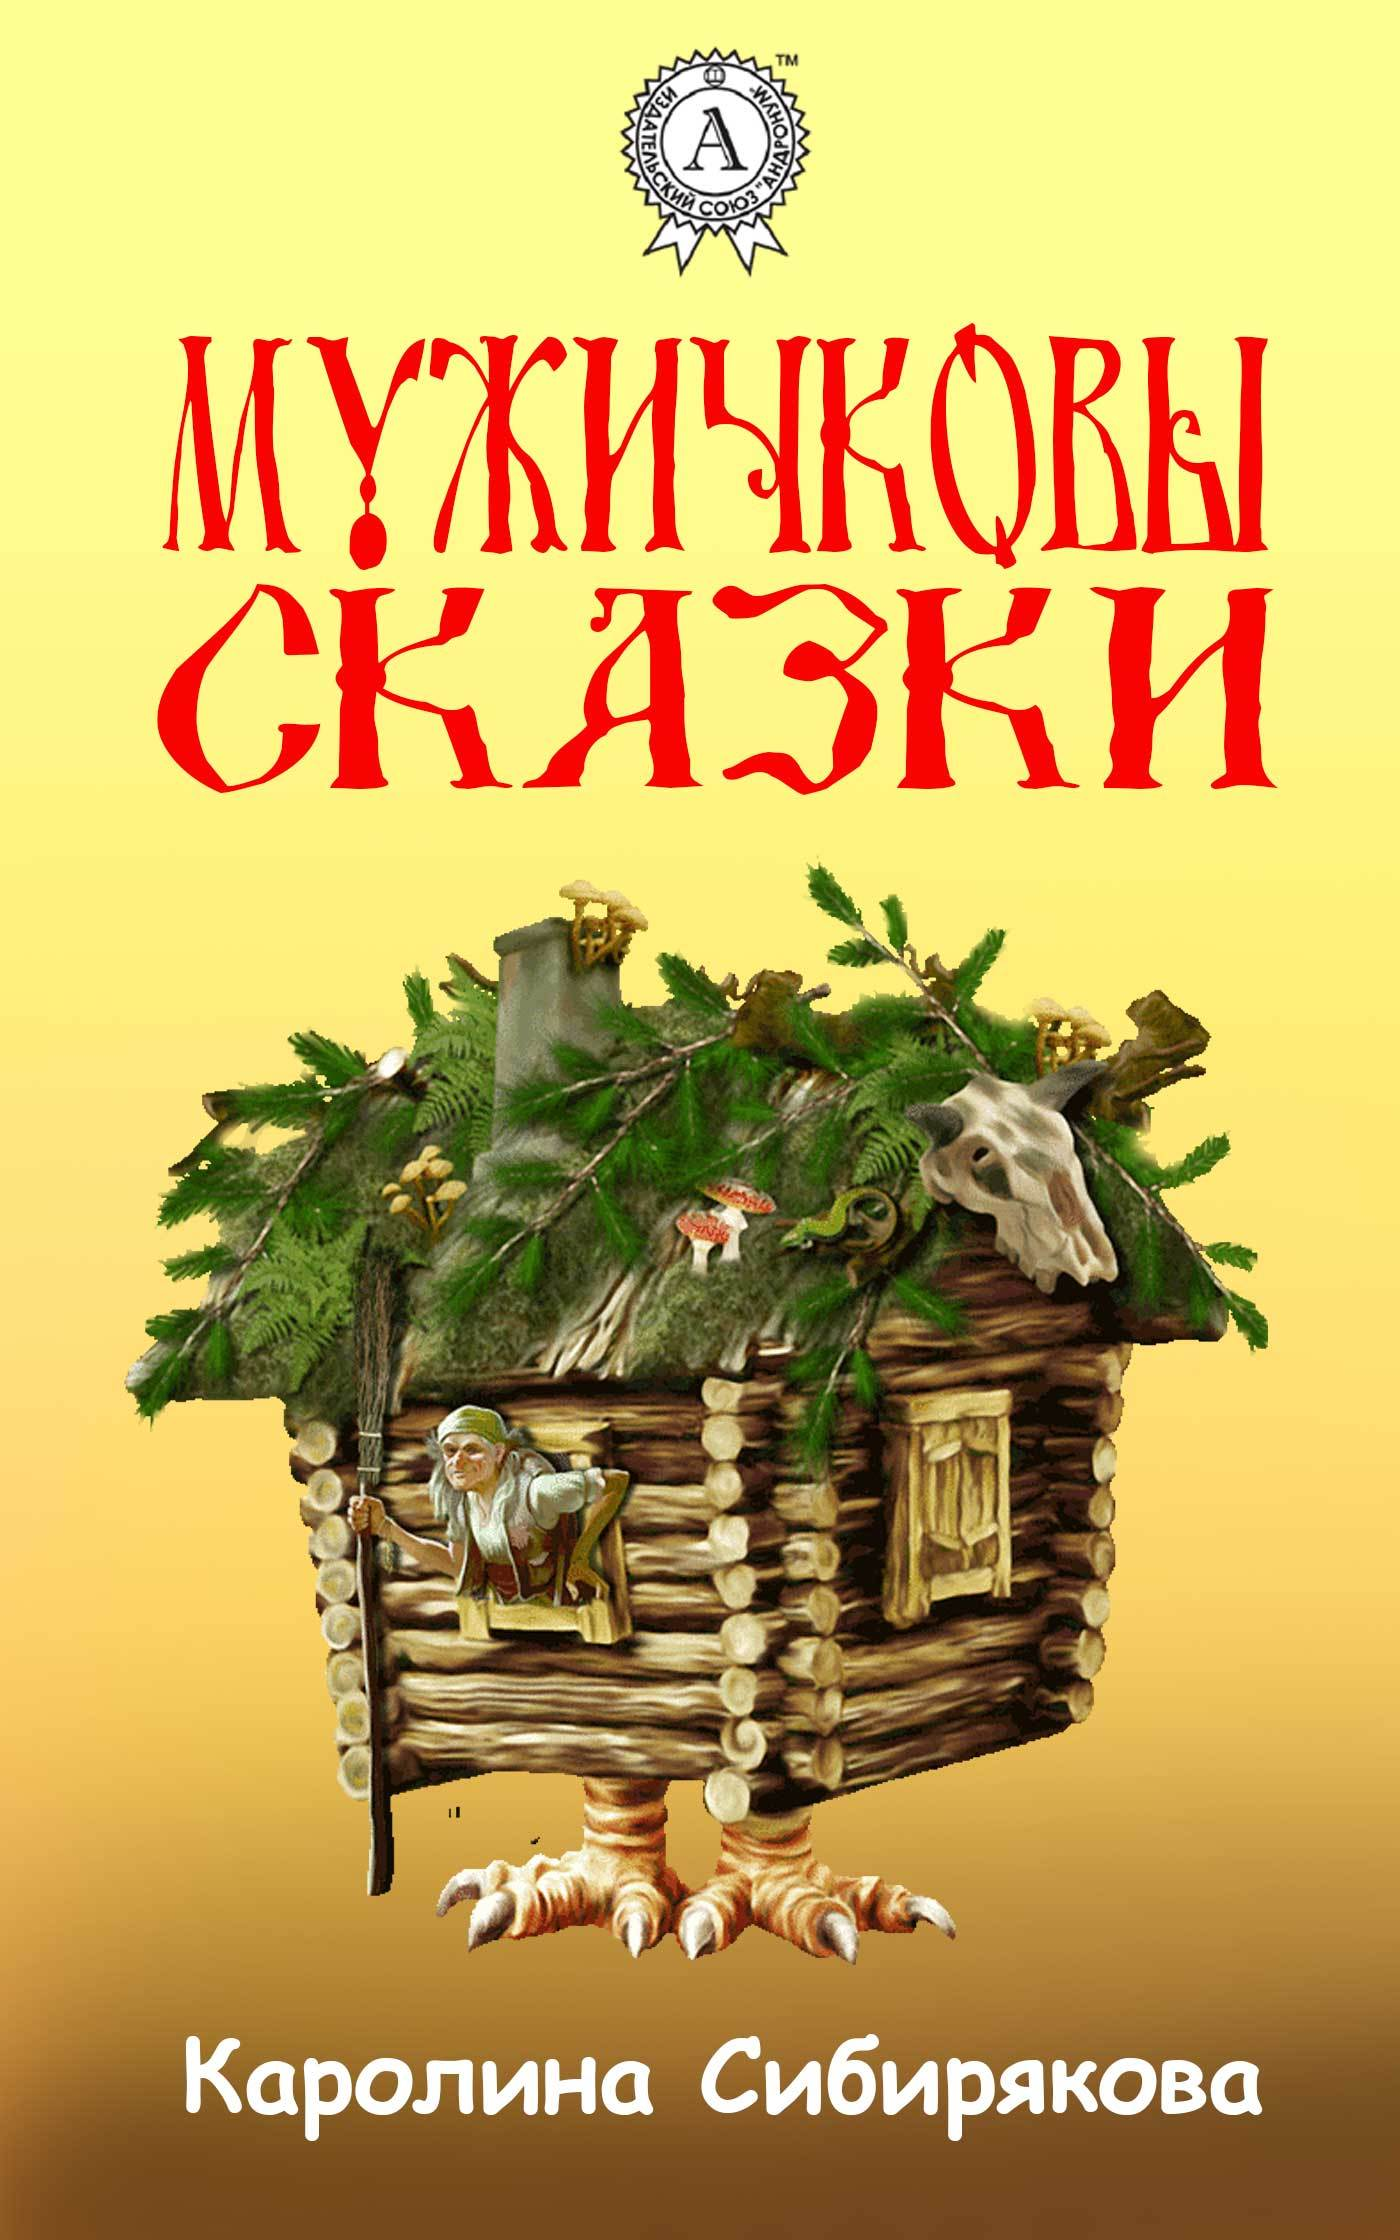 Каролина Сибирякова - Мужичковы сказки